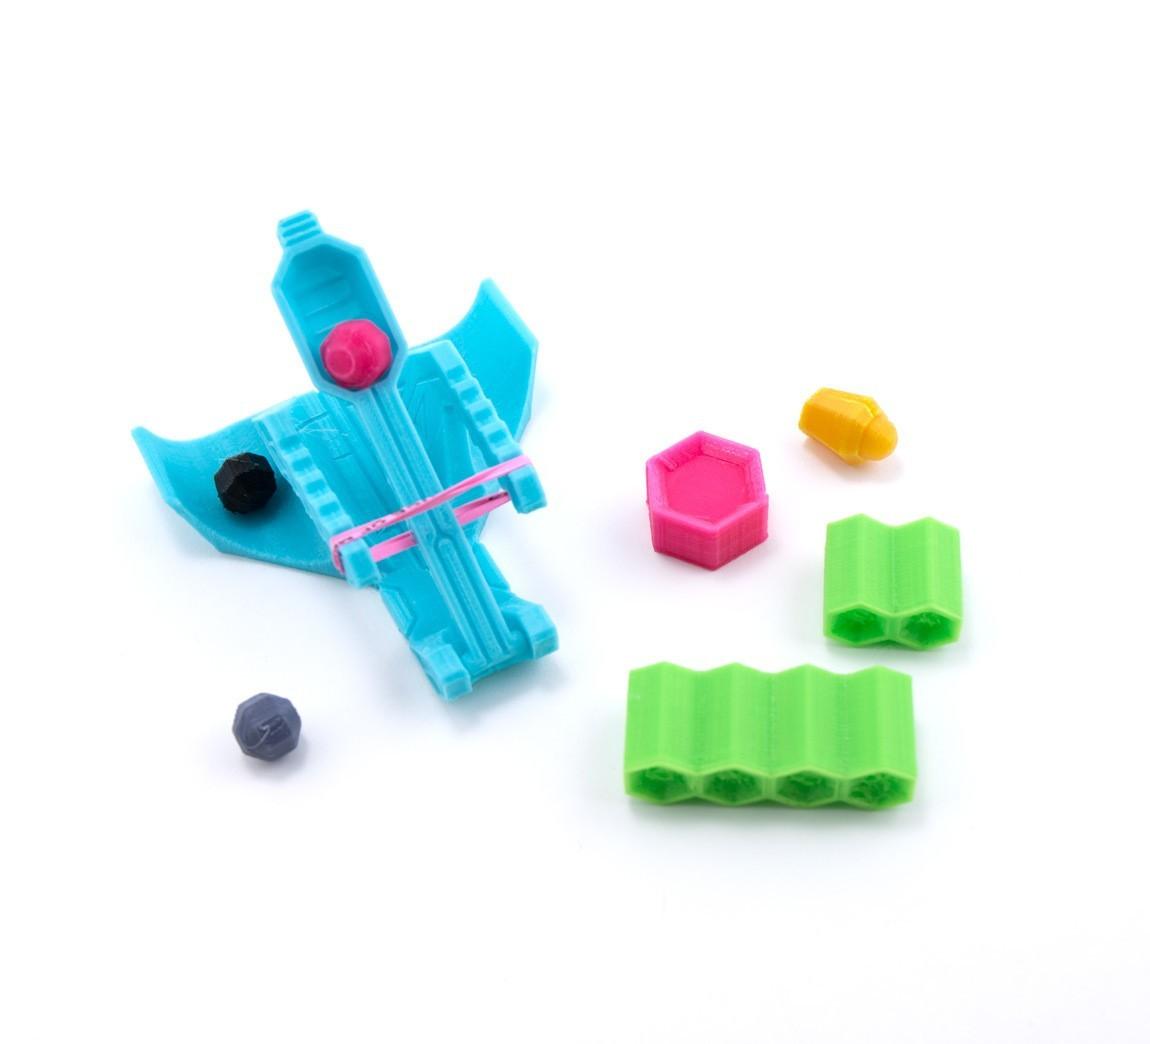 eff76c99dfcb90fbd191b859717f213b_1448060903964_NMD000202-17.jpg Download free STL file Catapult Defense • 3D print model, FerryTeacher